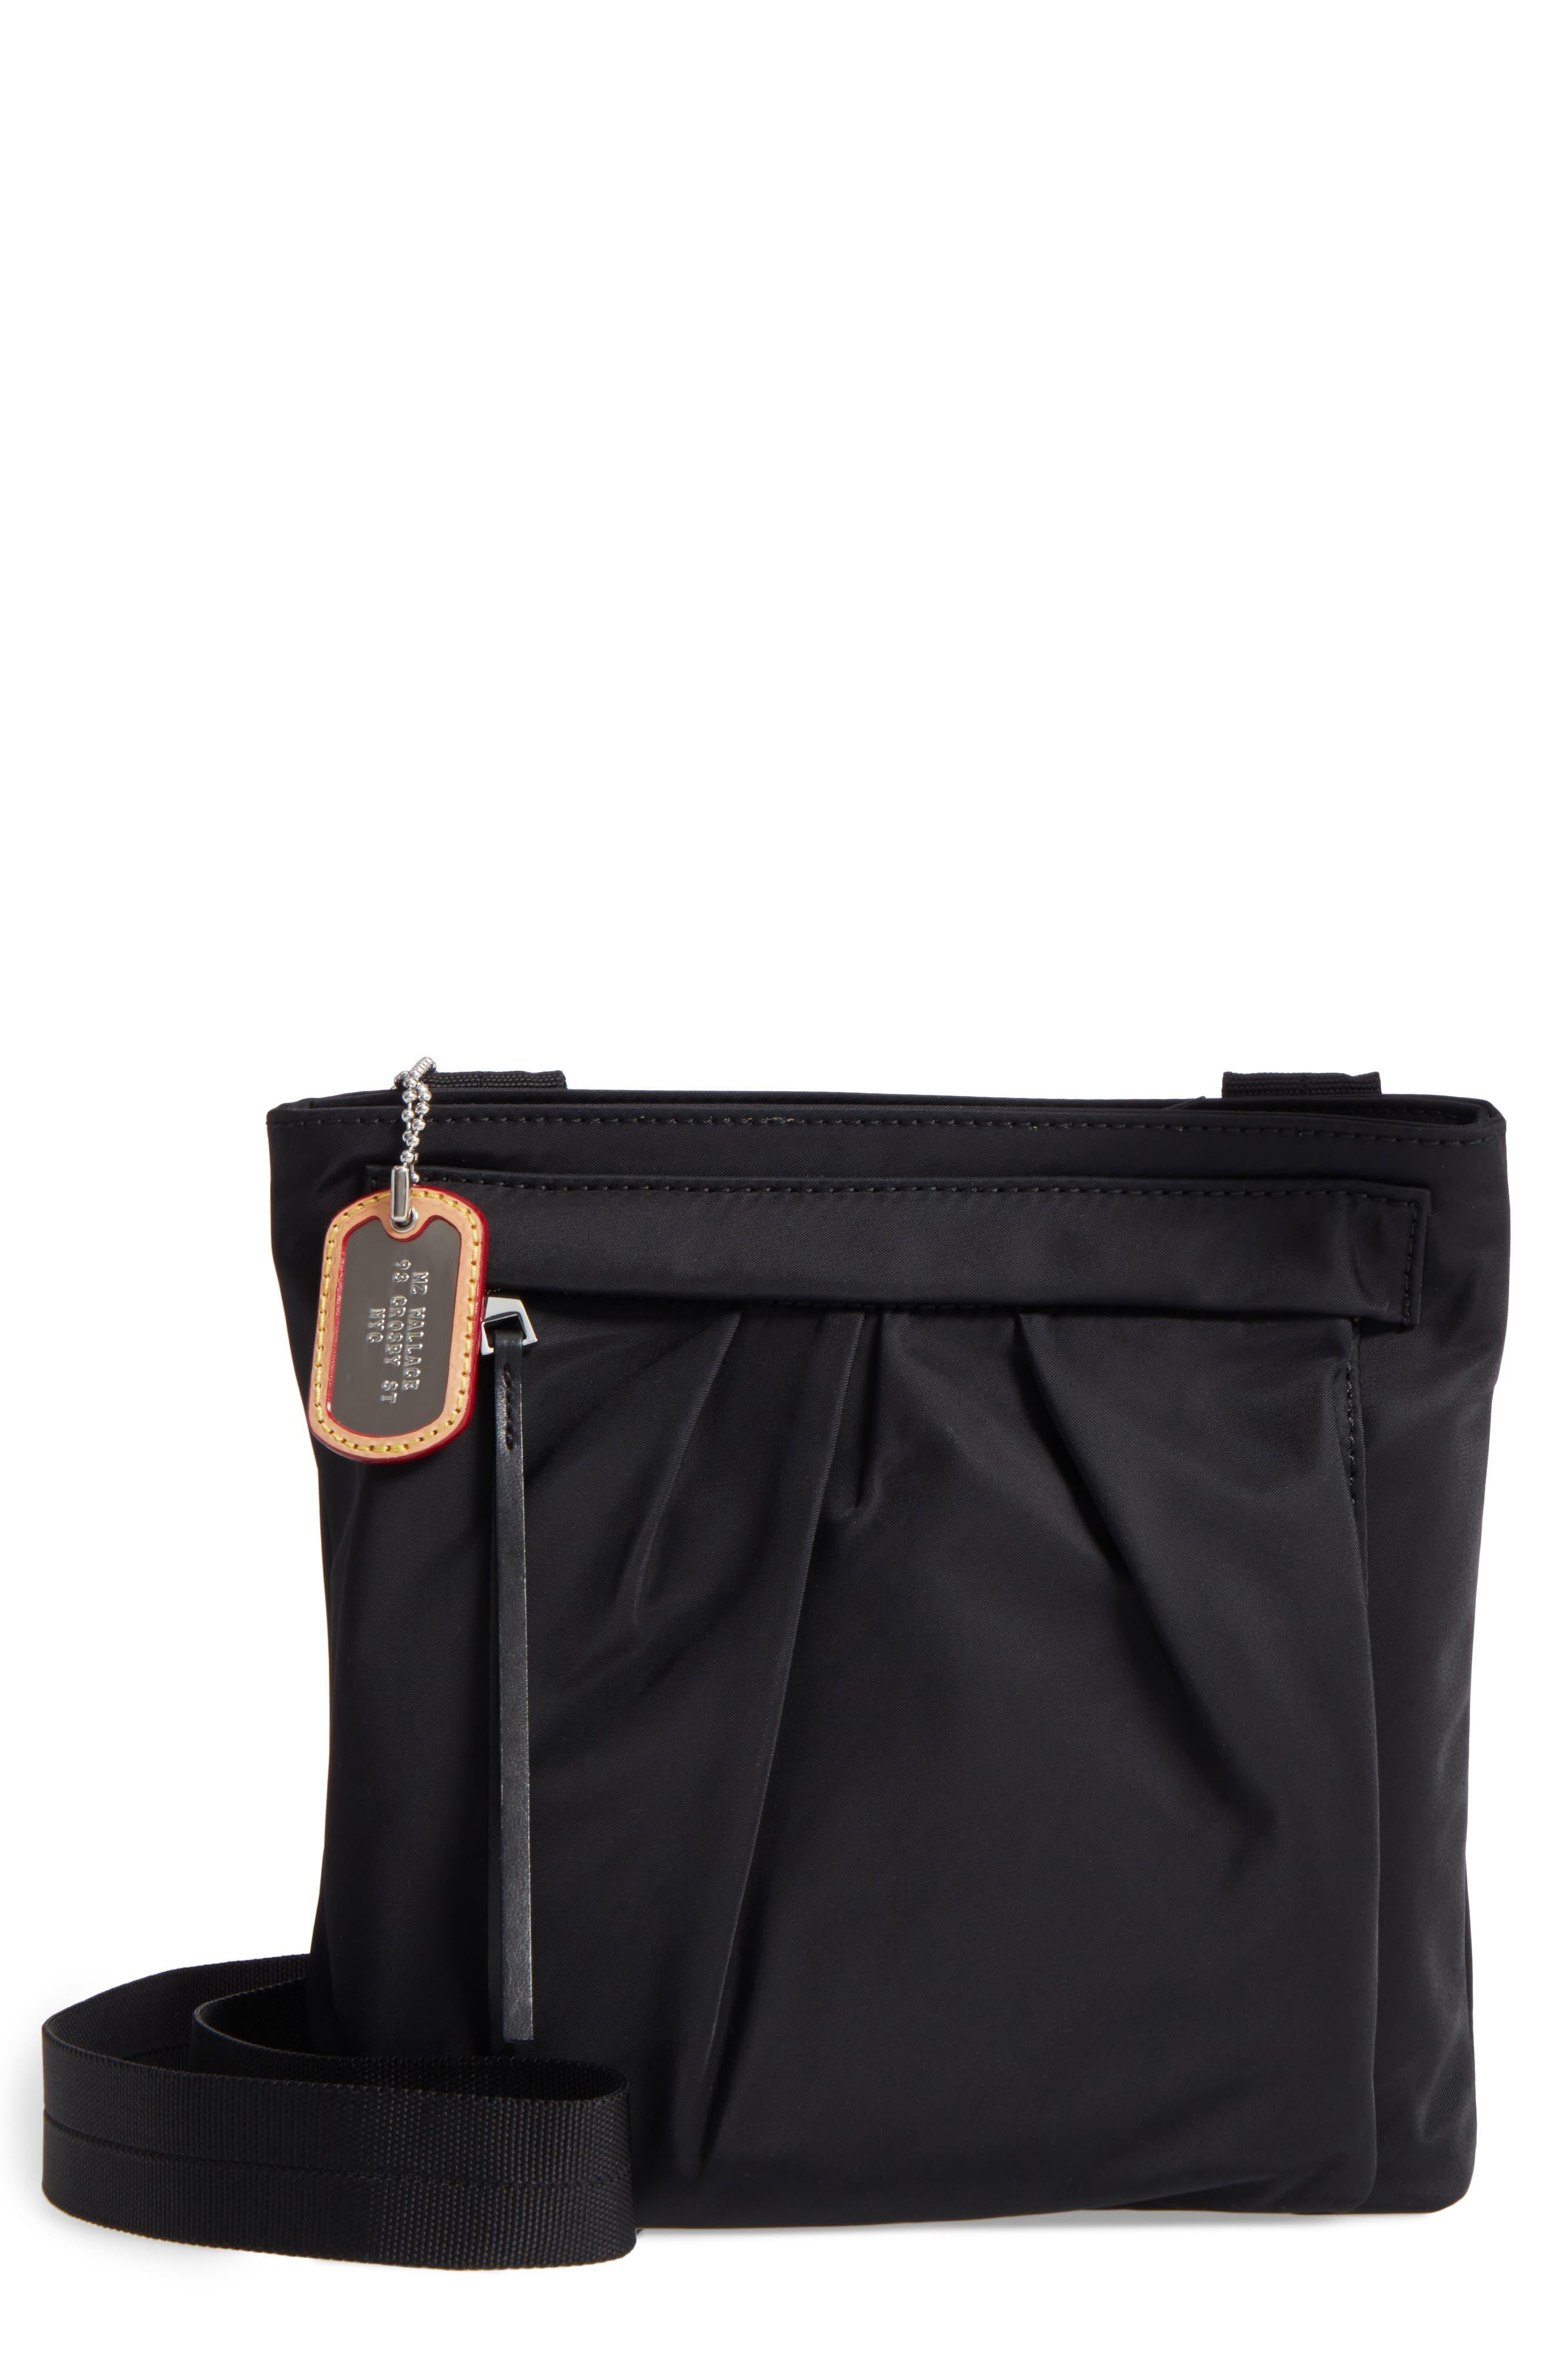 Jordan Bedford Nylon Crossbody Bag,                             Main thumbnail 1, color,                             008